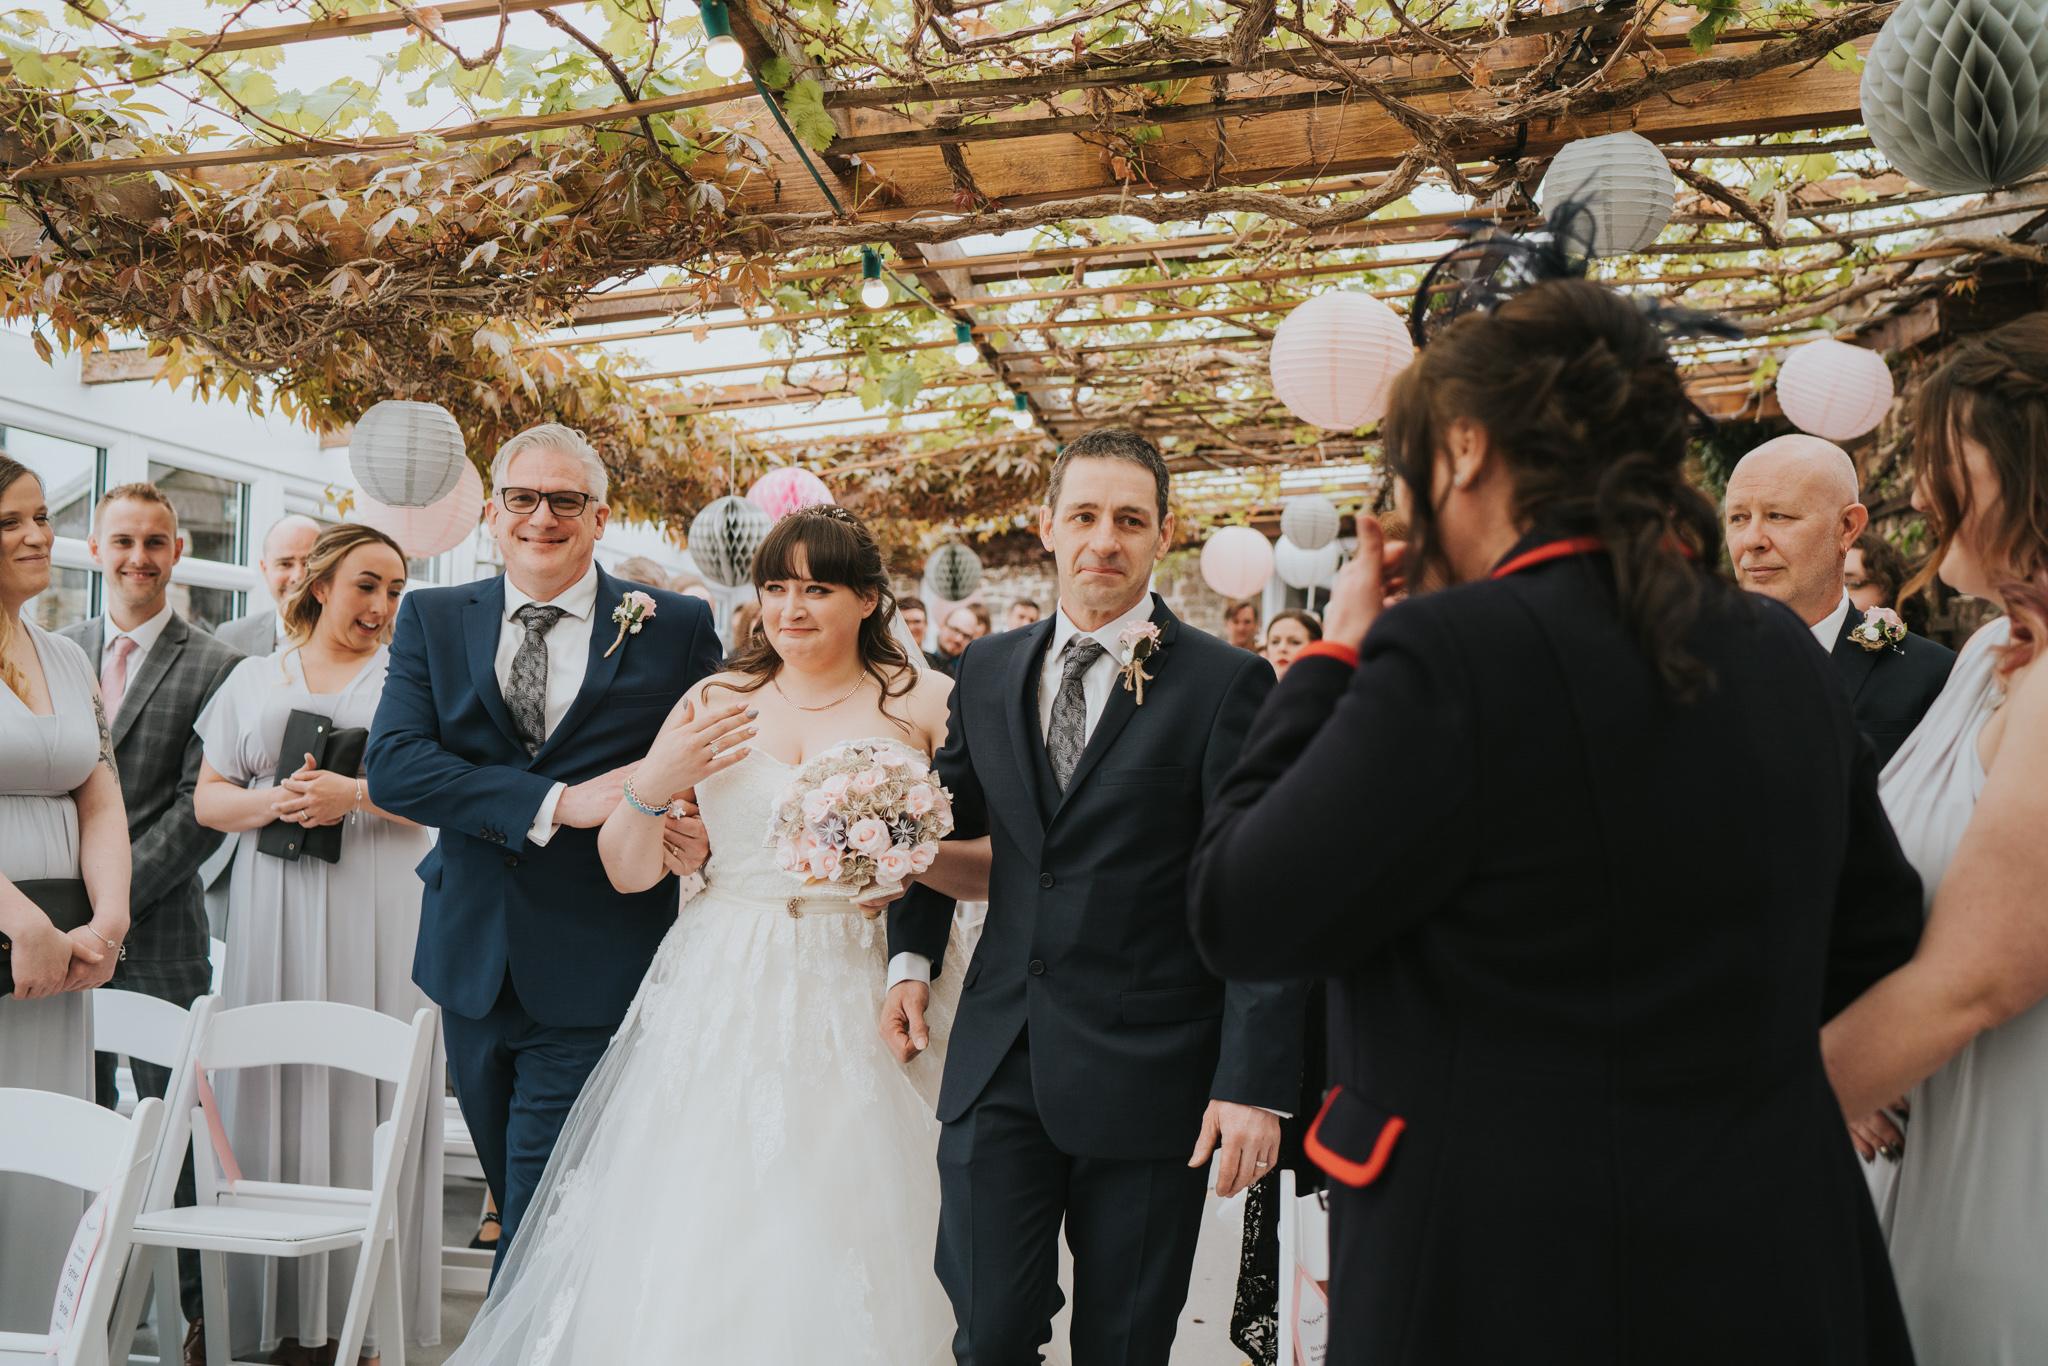 grace-sam-old-barn-clovelly-devon-wedding-photographer-grace-elizabeth-essex-suffolk-norfolk-wedding-photographer (45 of 132).jpg